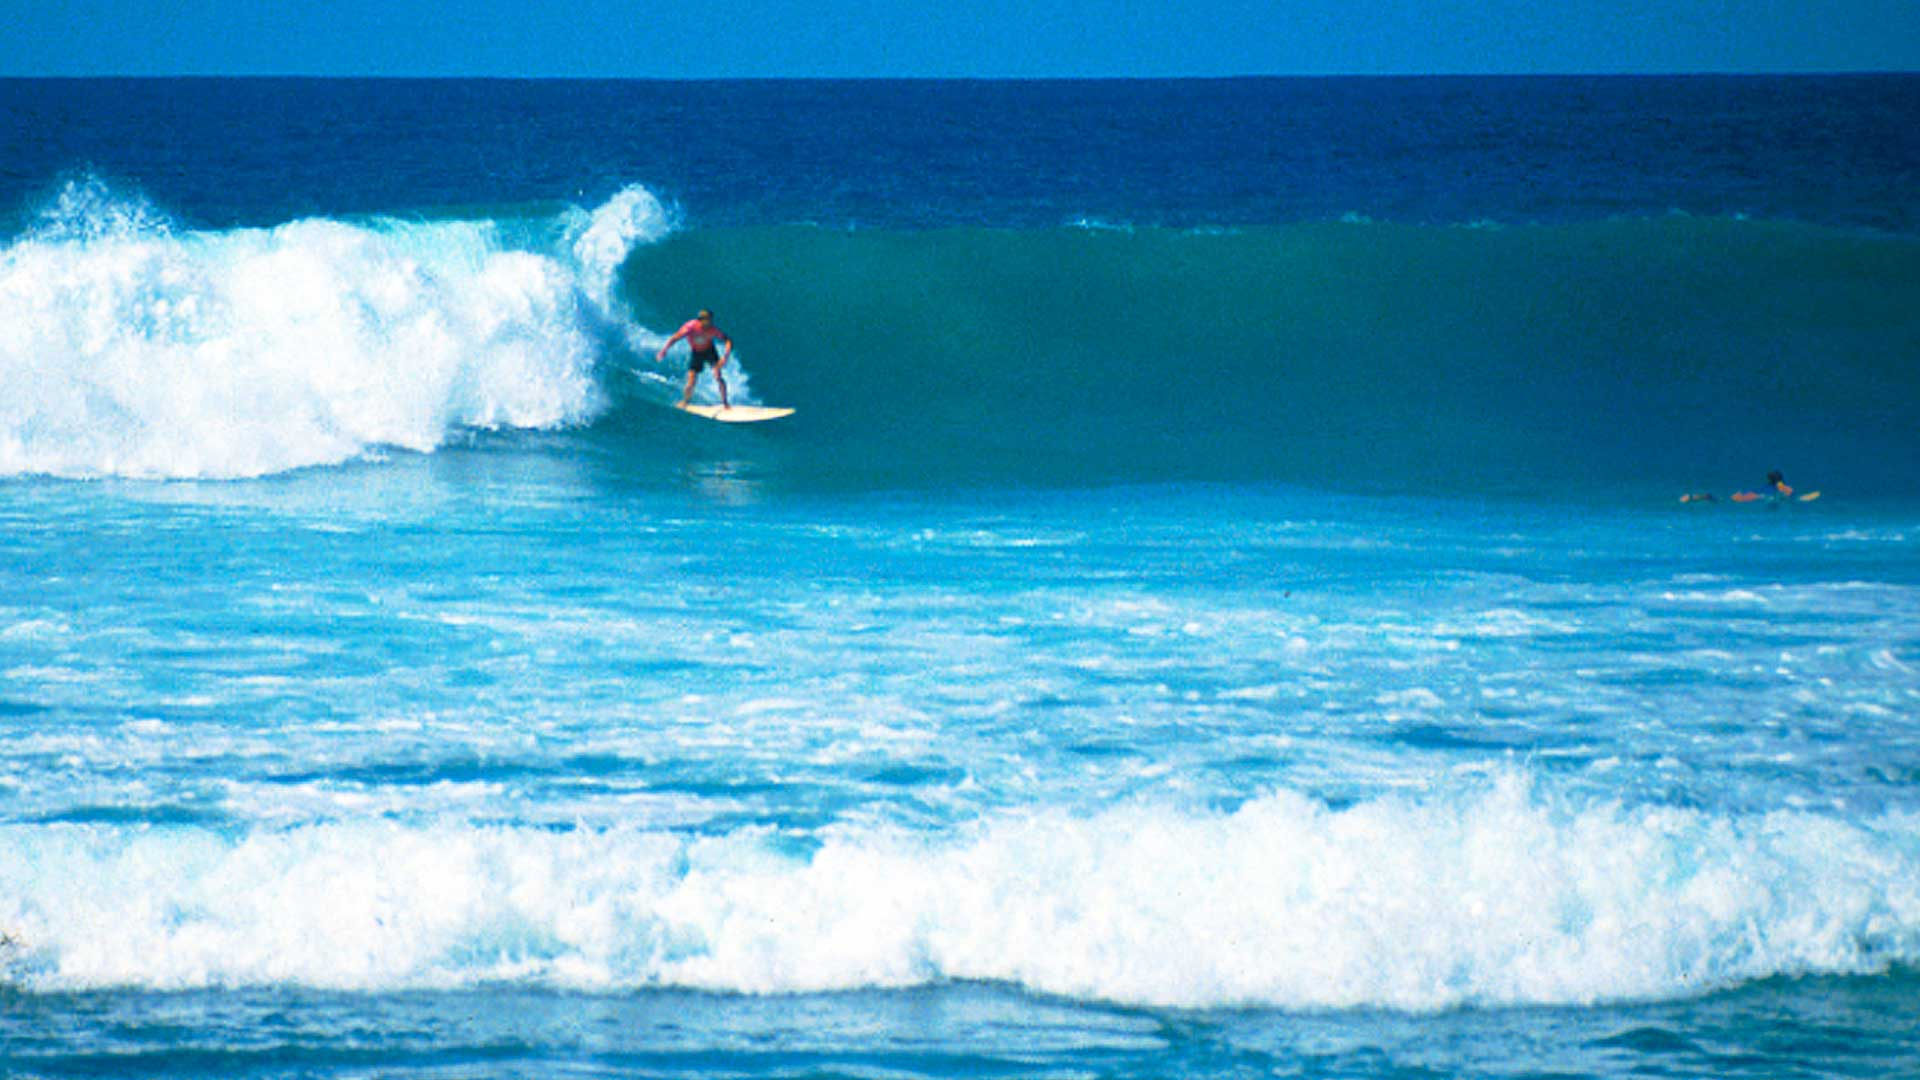 Steven Andrew Martin 1992 – South swells at Lyman's Point, Kailua-Kona, Big Island